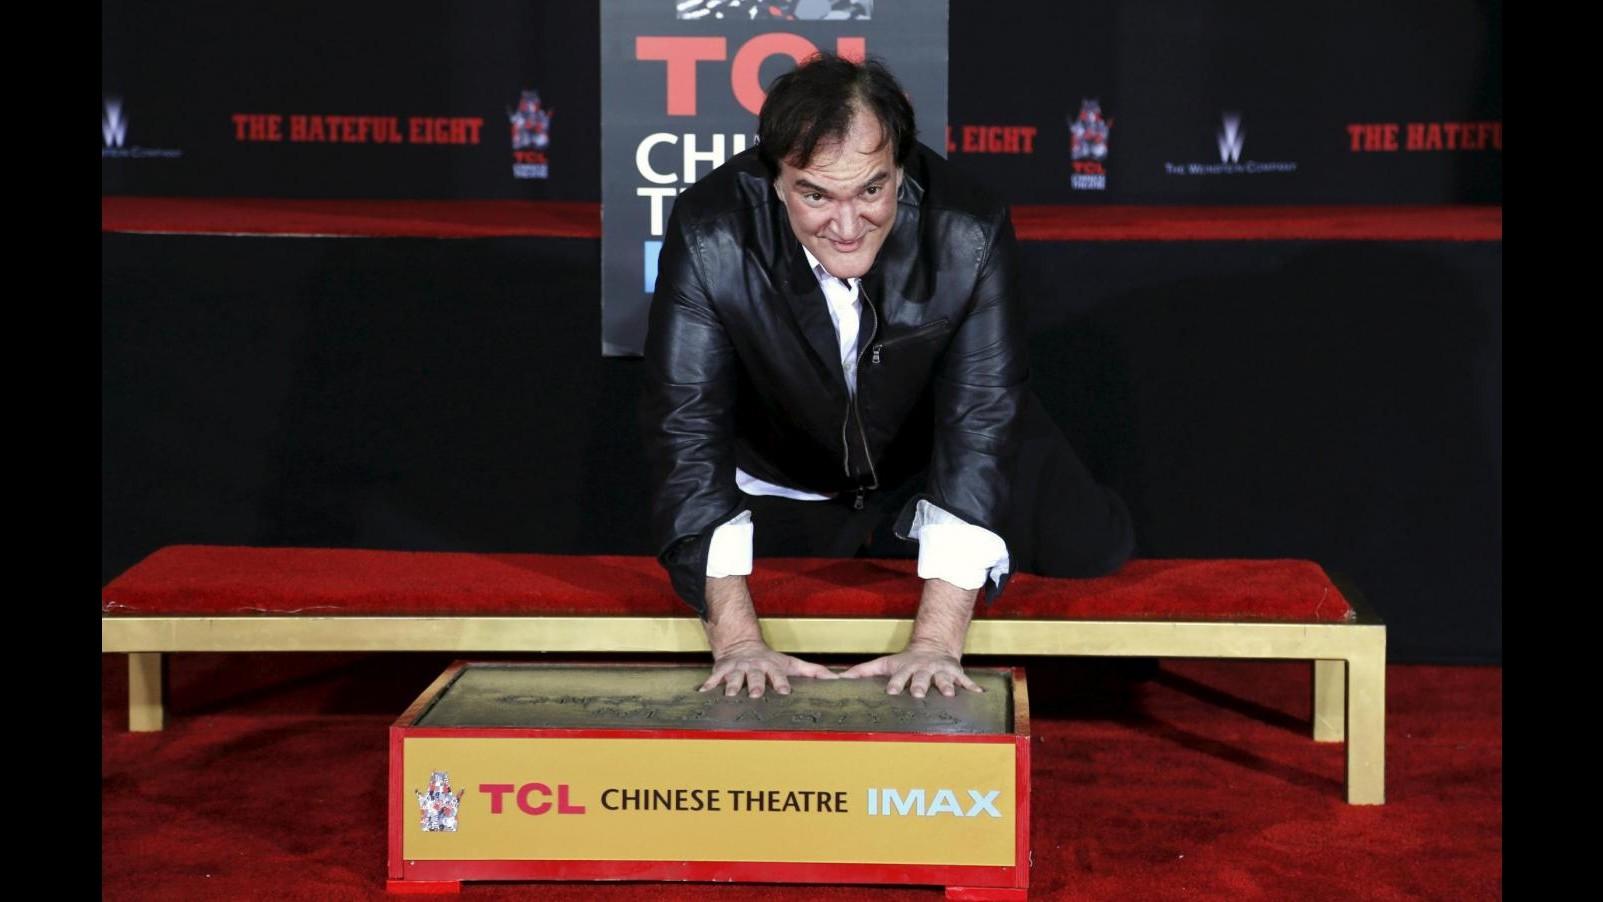 Quentin Tarantino lascia le sue impronte a Hollywood